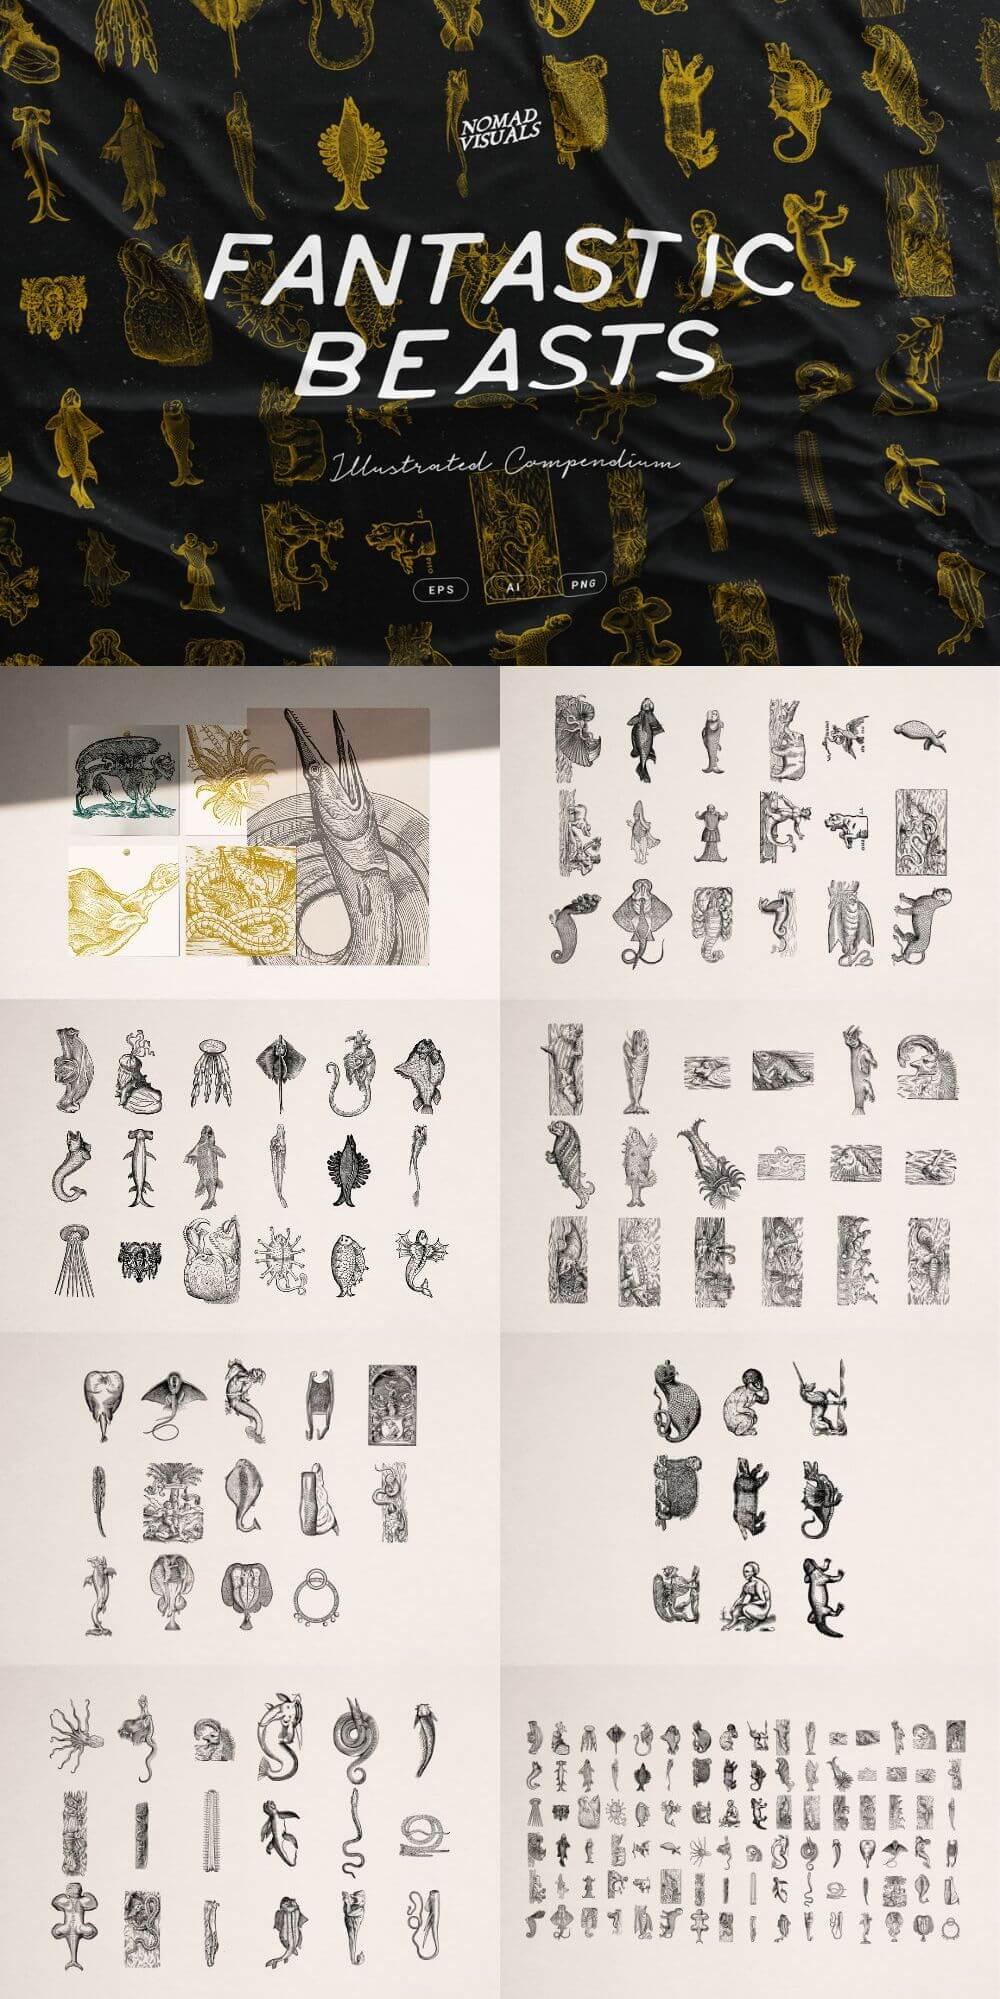 Fantastic Beasts Illustrations